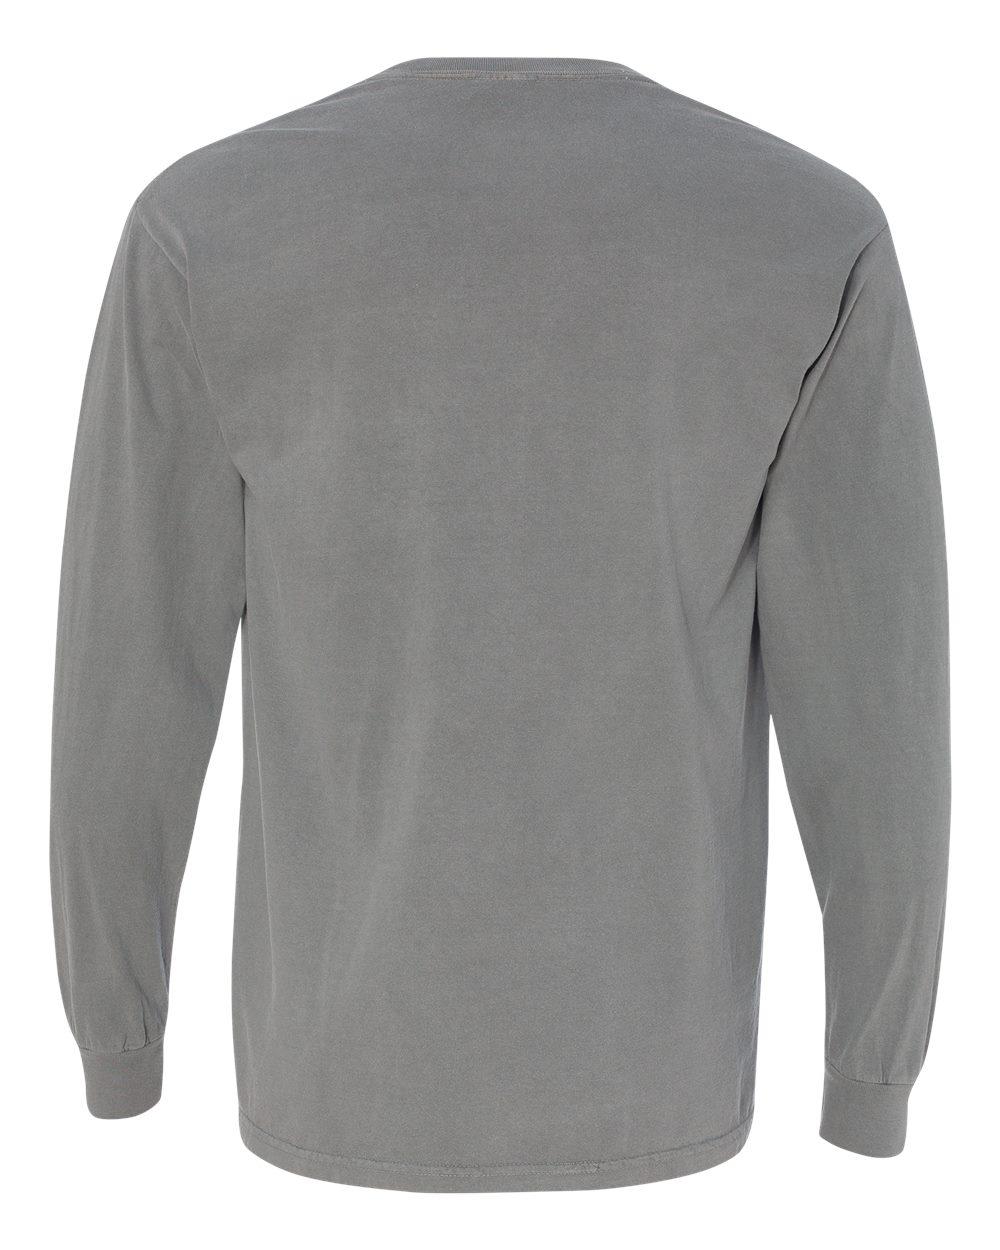 Comfort-Colors-Men-039-s-6-1-oz-Long-Sleeve-Pocket-T-Shirt-C4410-S-3XL thumbnail 18